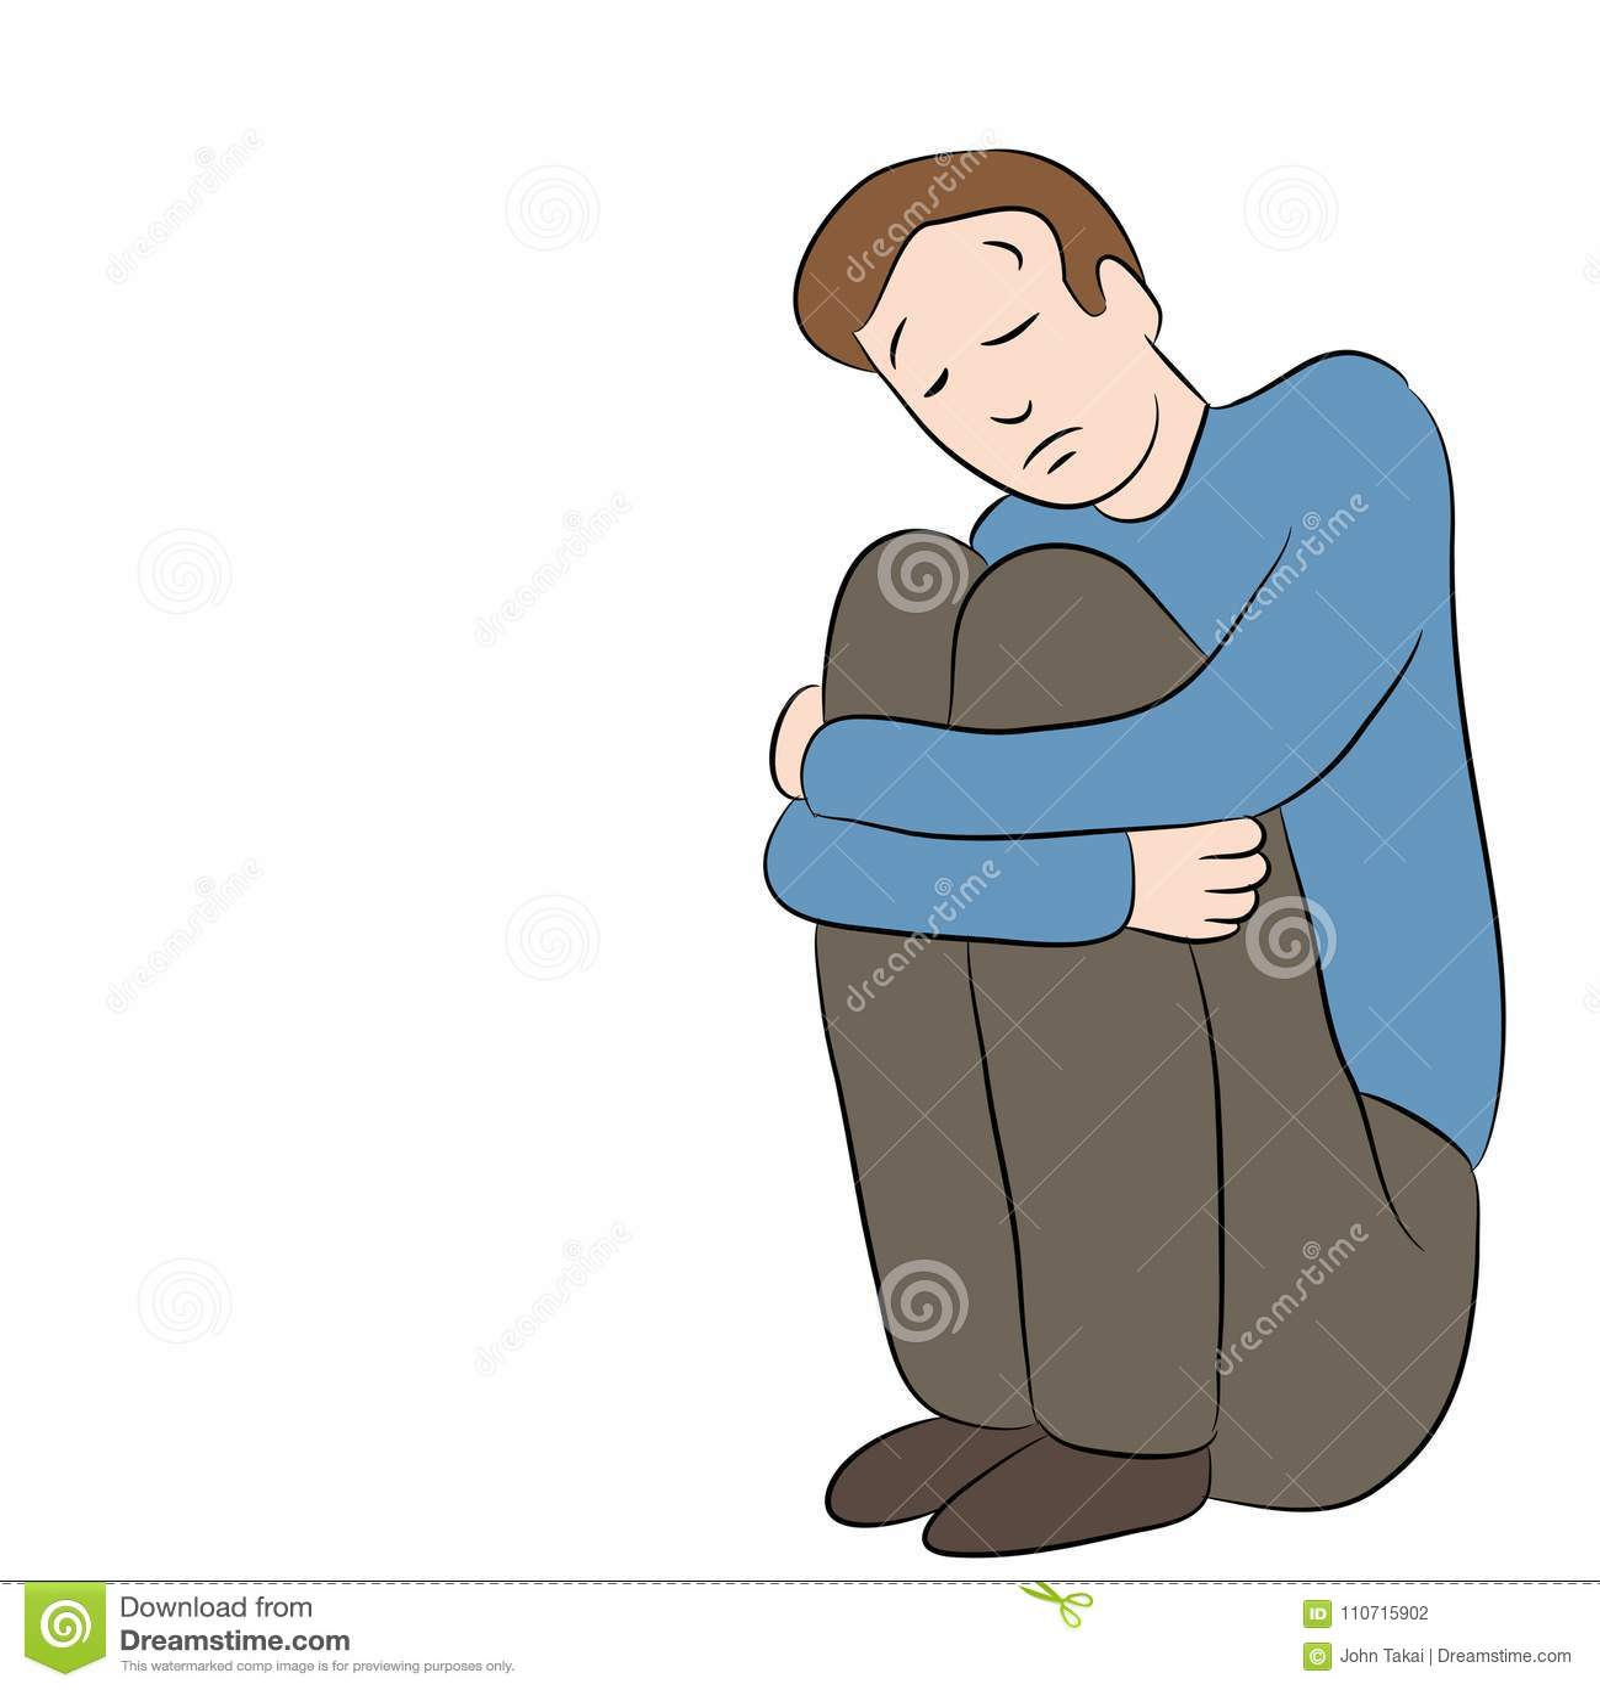 Depressed Sad Lonely Man Sitting Stock Vector Illustration Of Cartoon Clip 110715902